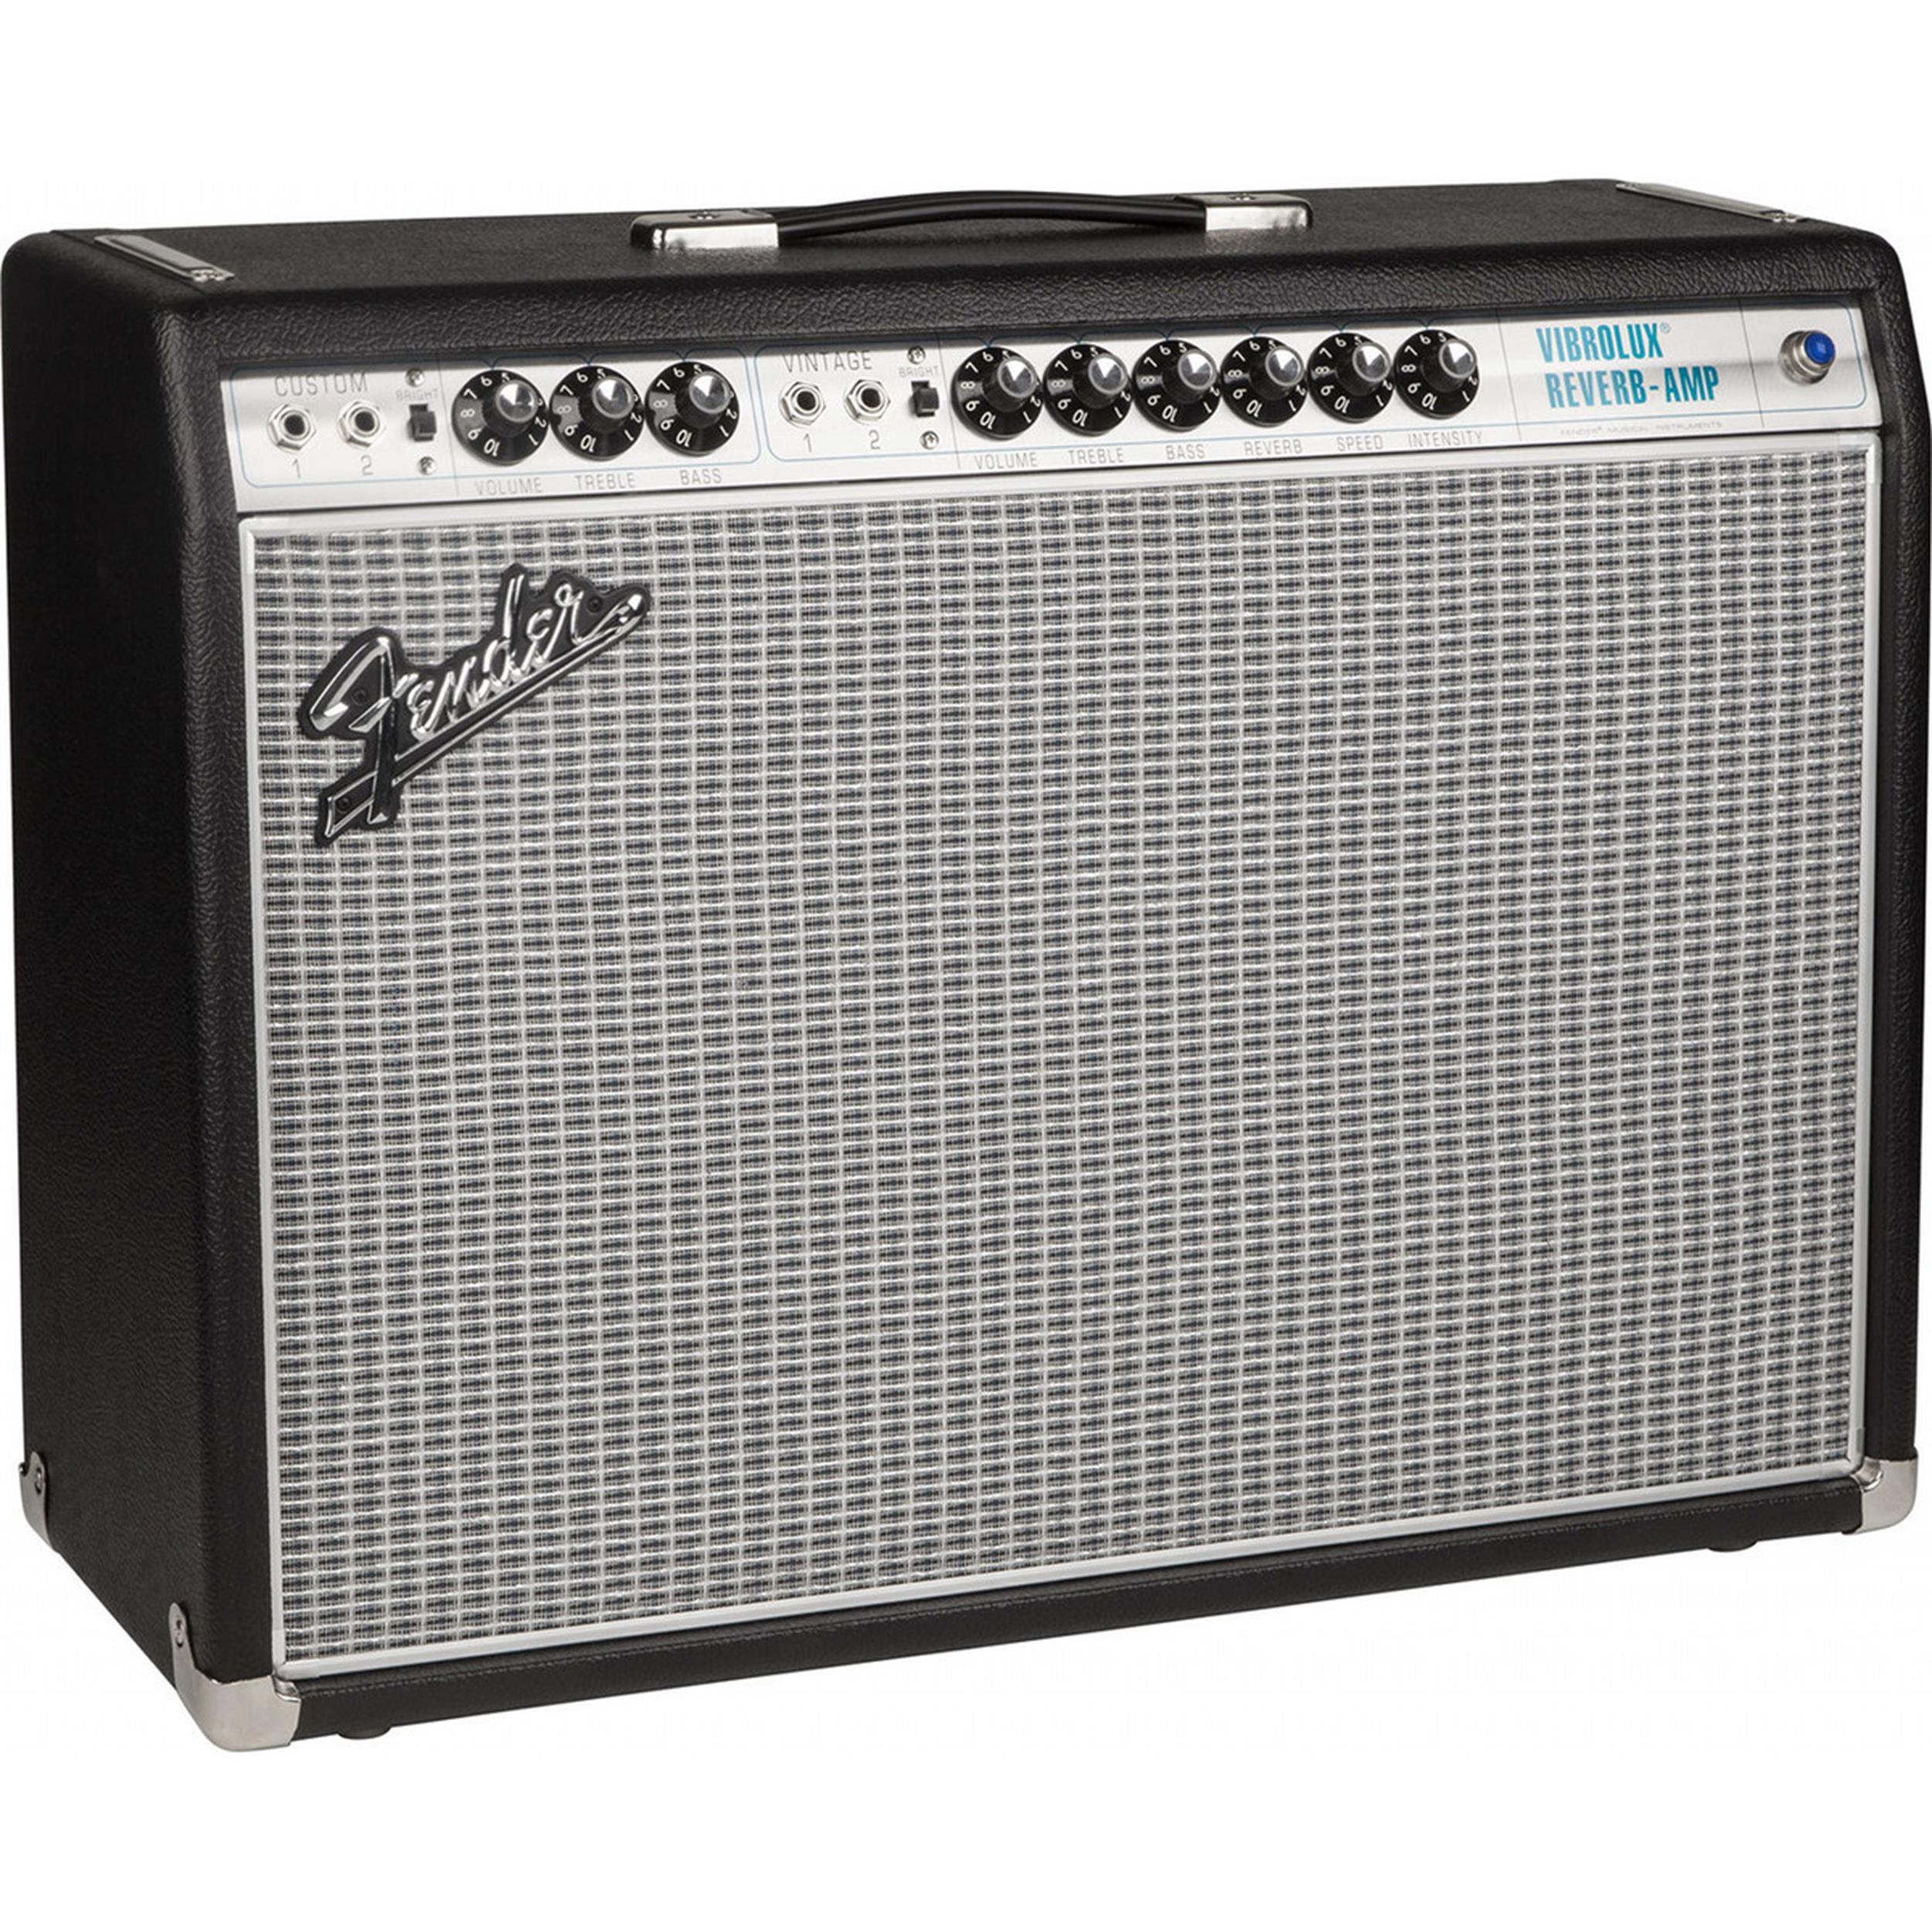 FENDER 68 CUSTOM VIBROLUX REVERB AMP- 2275006000